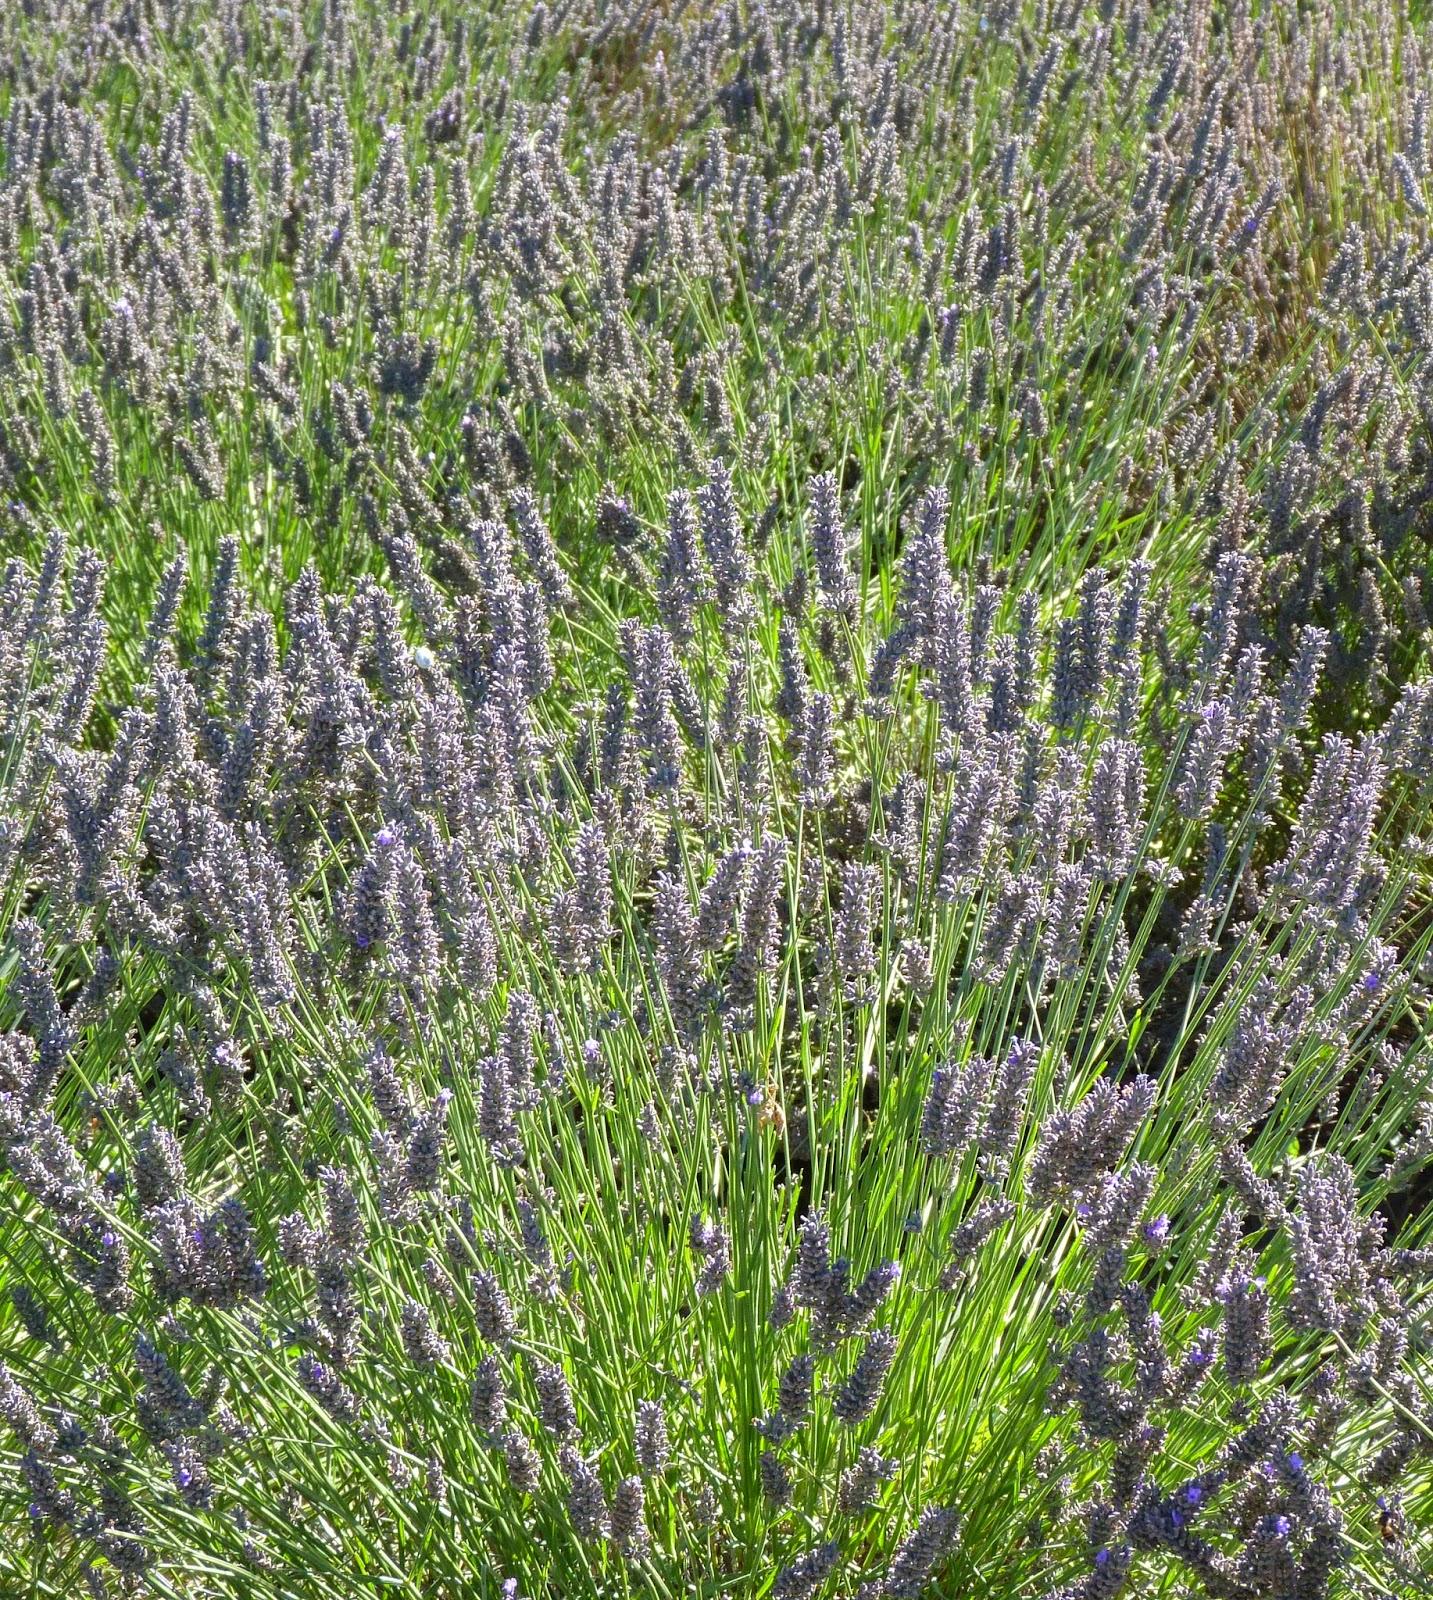 Deborah Lawrenson: The lavender farm and distillery